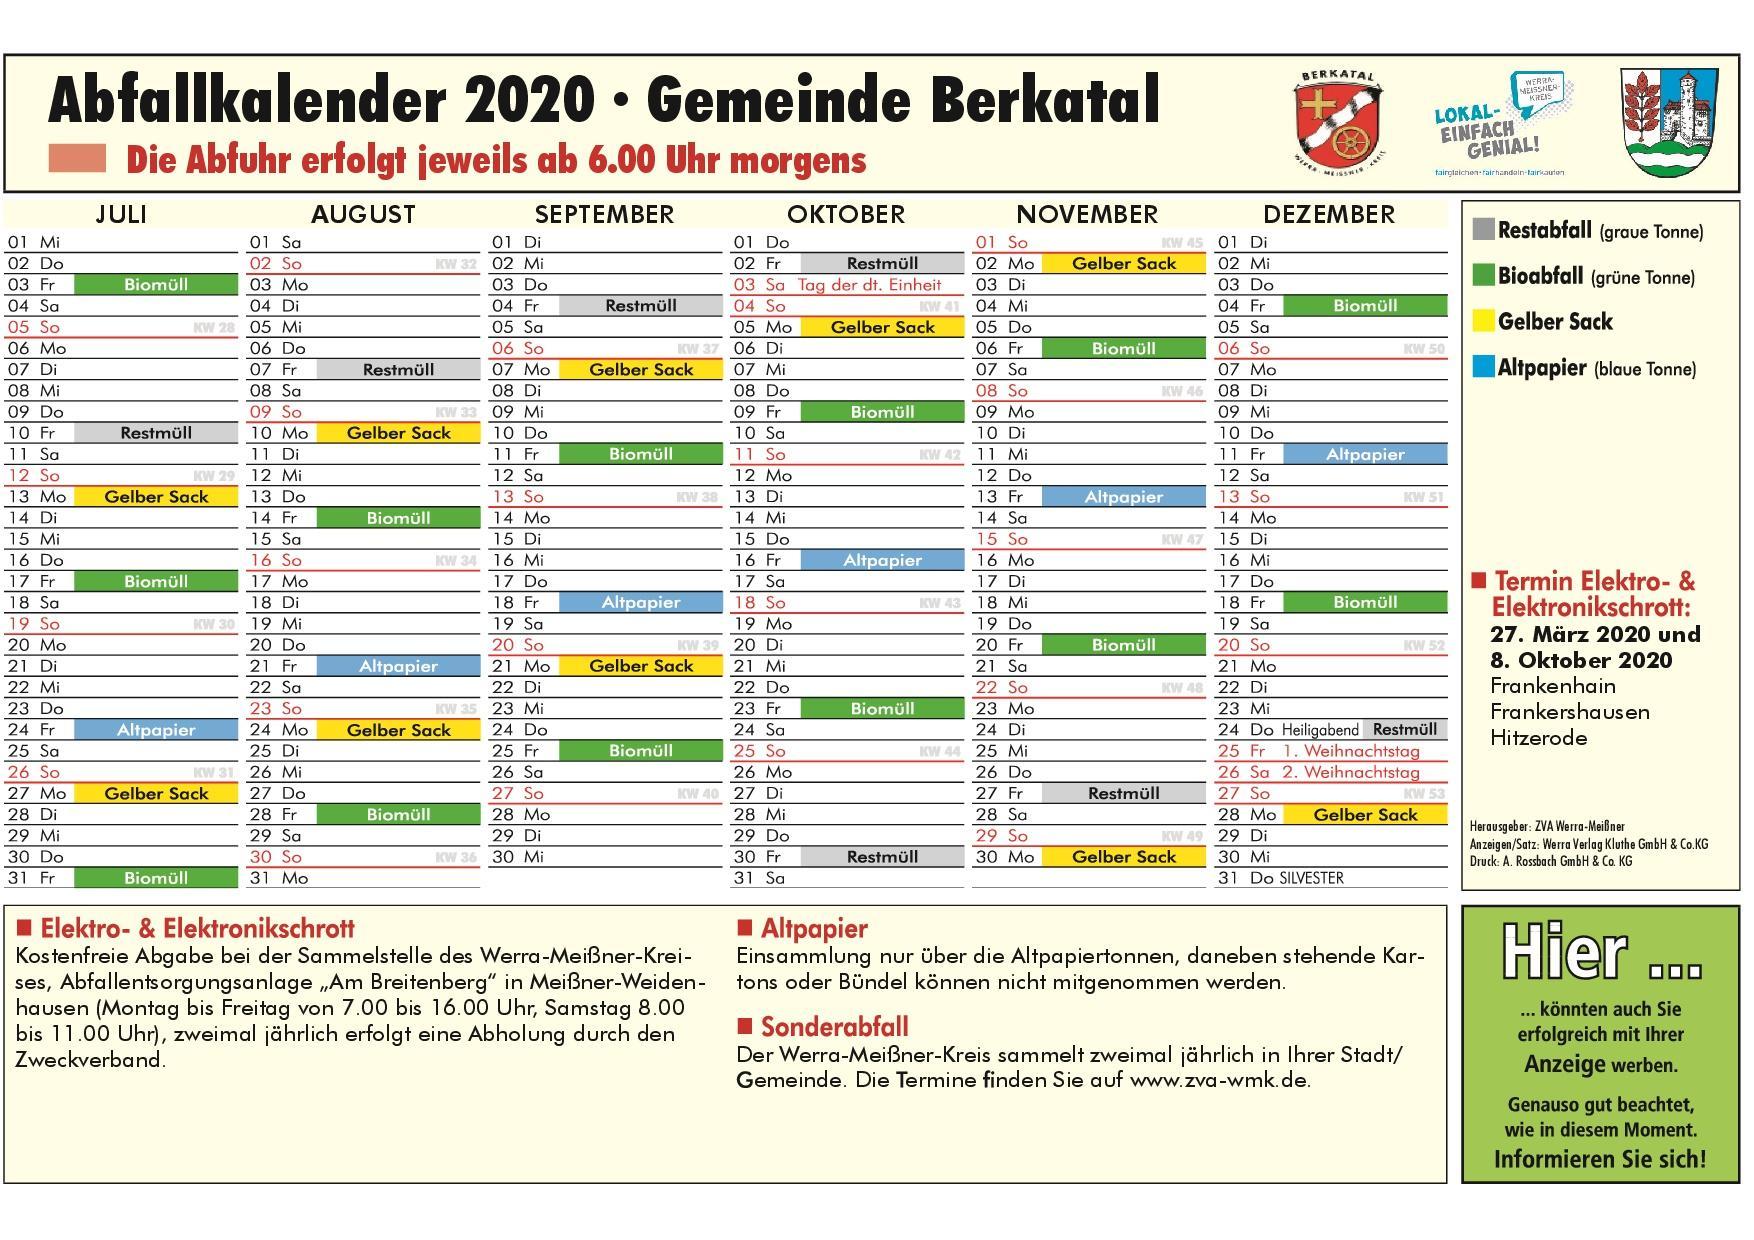 Abfallkalender 2. HJ 2020